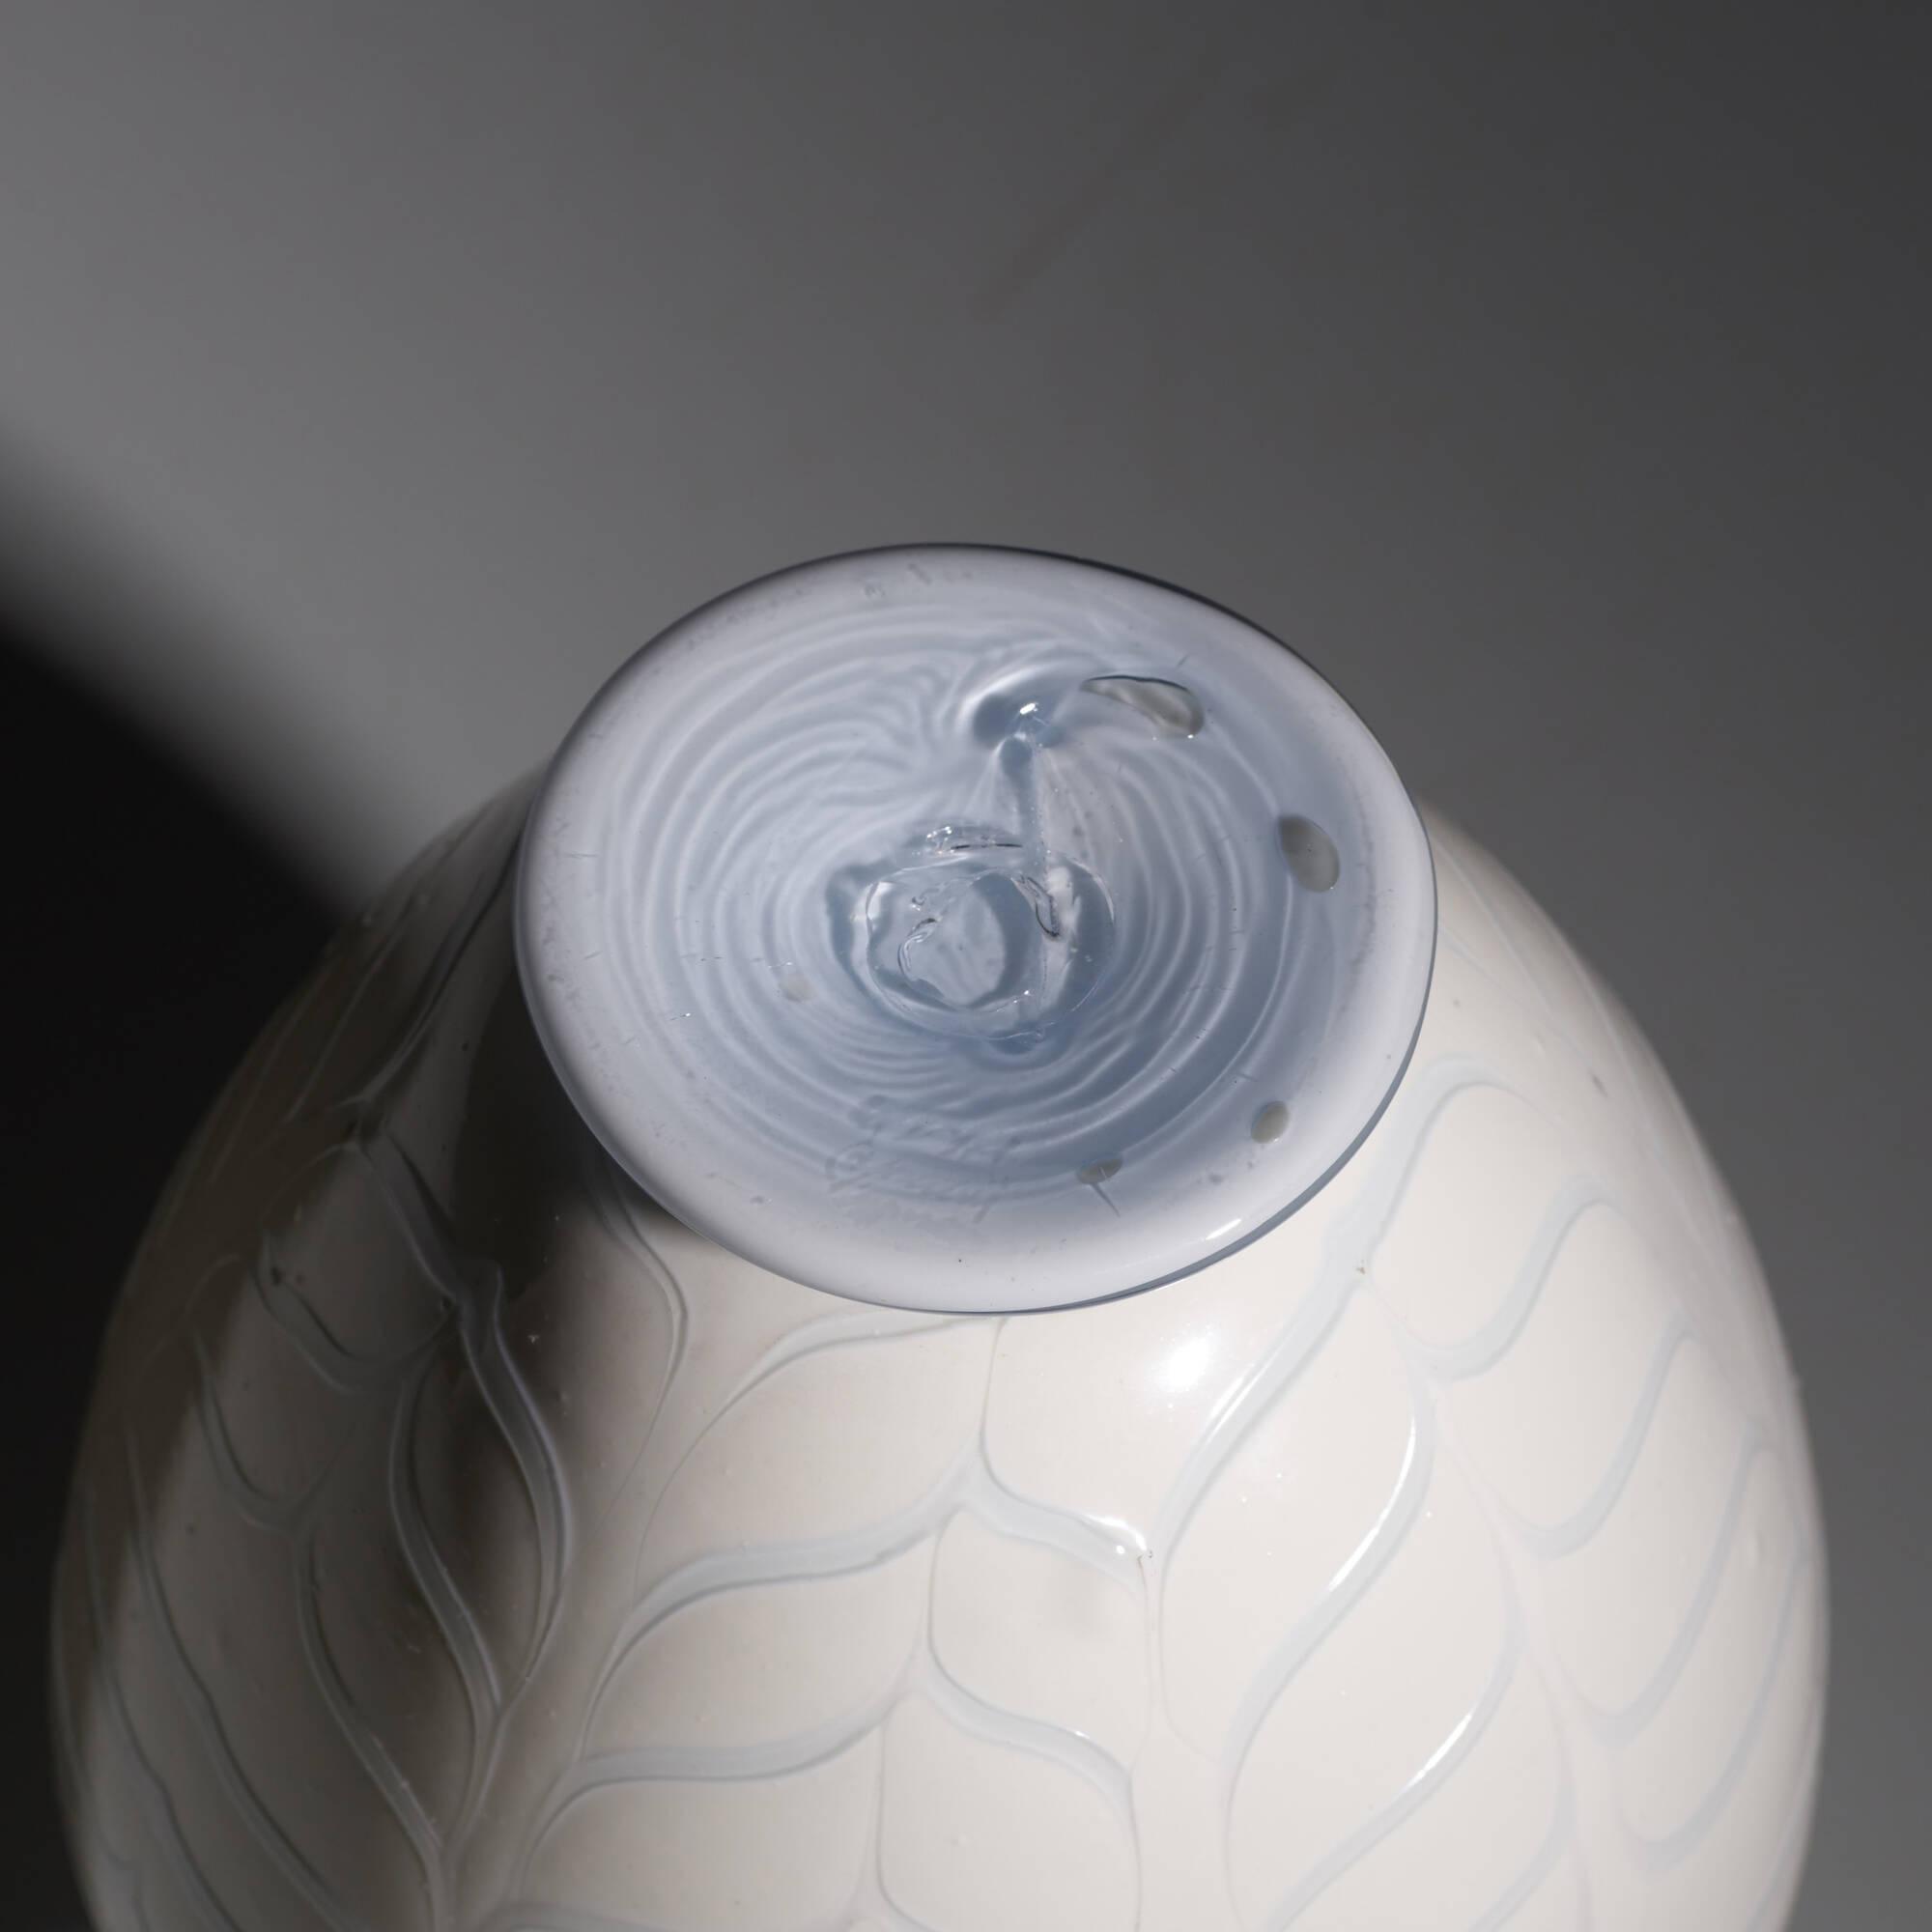 193: Carlo Scarpa / Fenici vase (3 of 3)